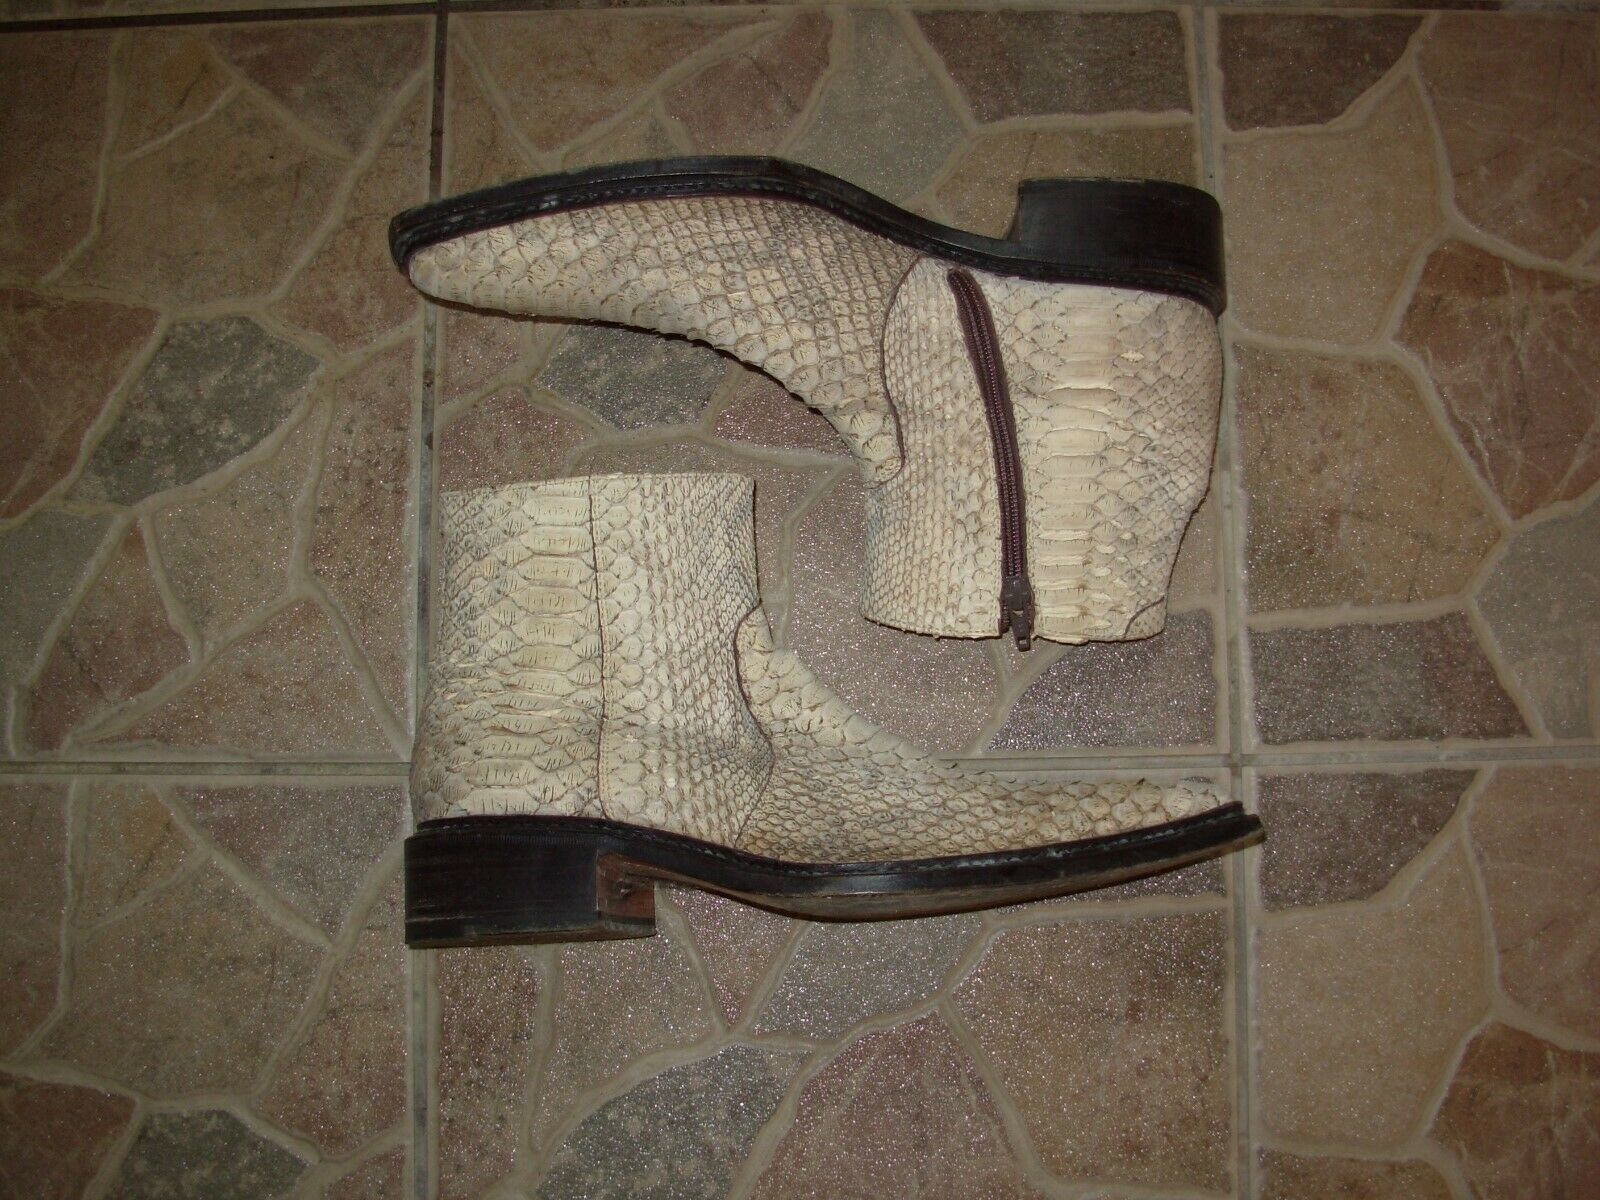 Ebano Western Style Snake Skin Leather Hand Made Cowboy Boots size 42